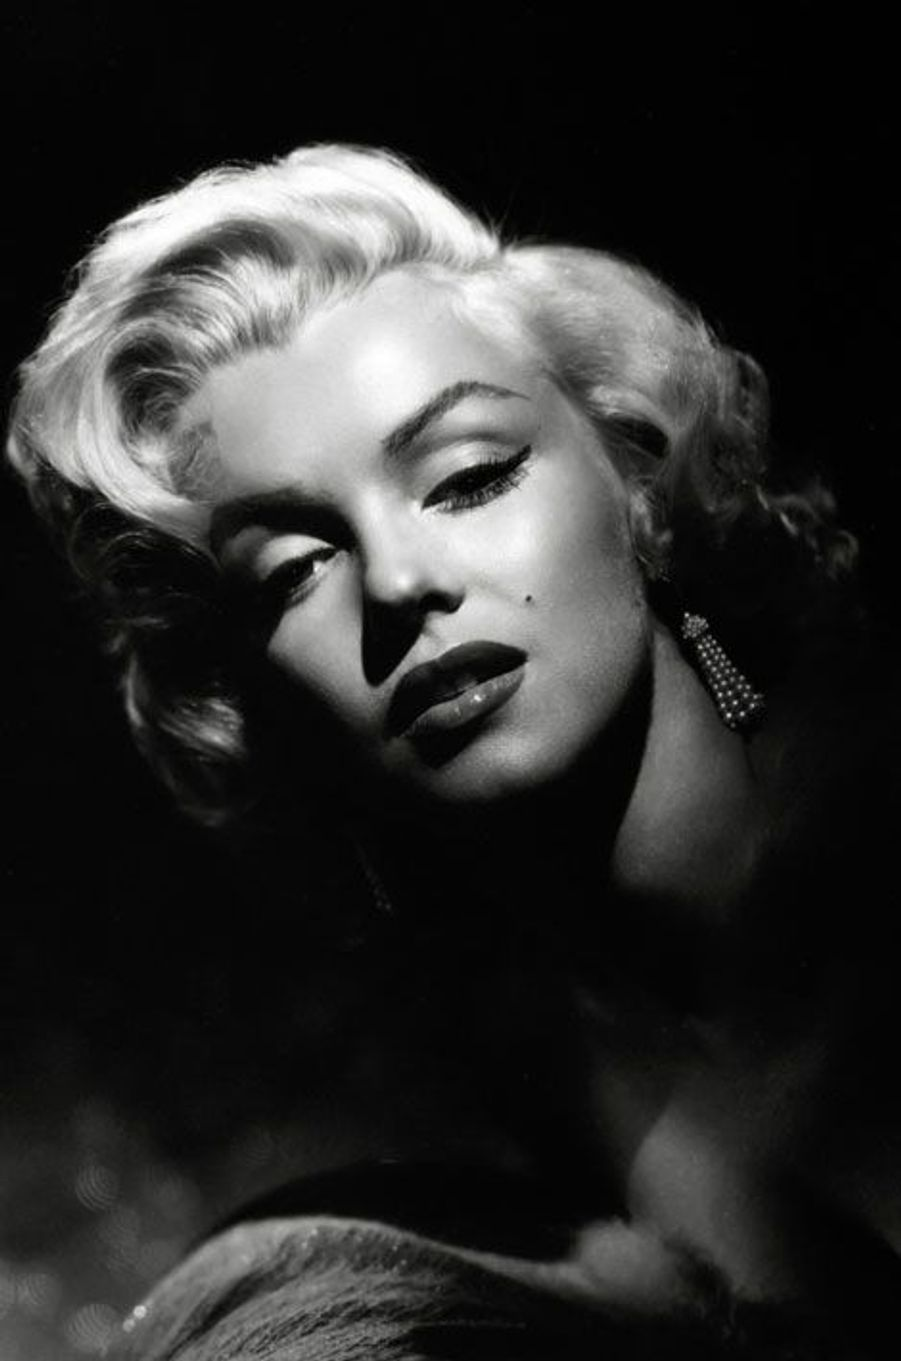 6- Marilyn Monroe 17 millions de dollars